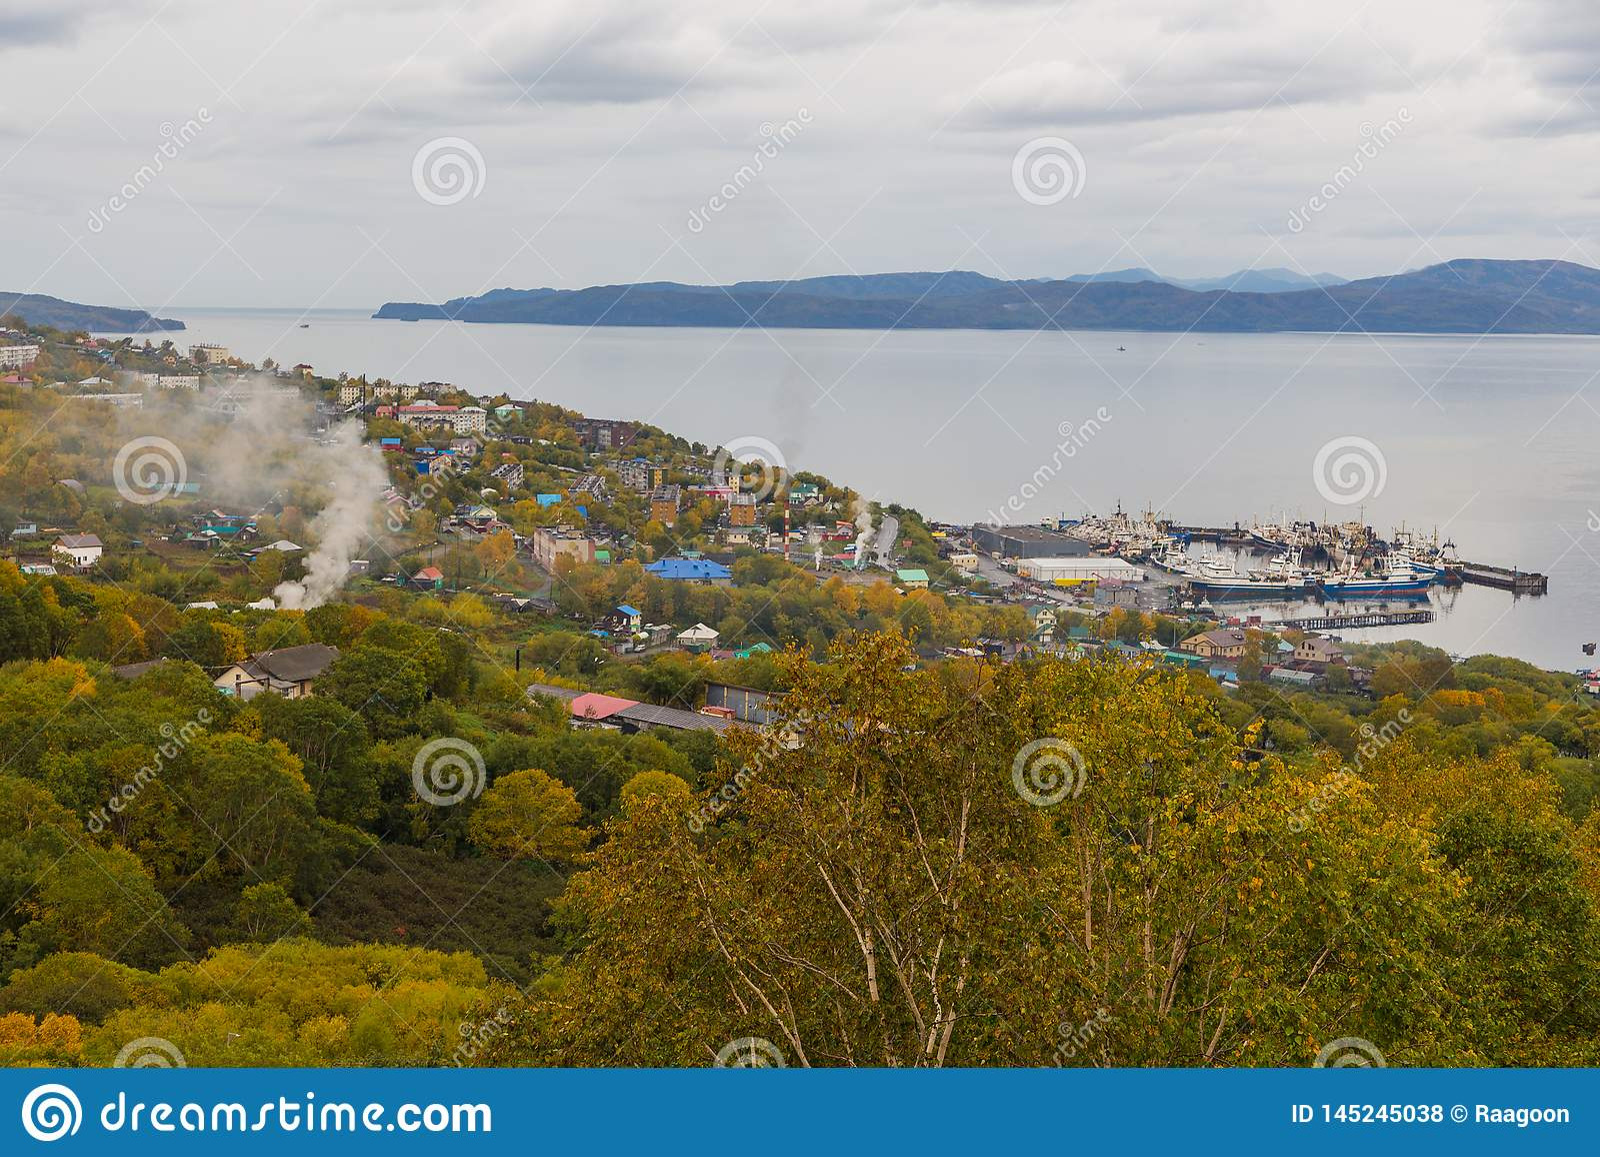 Vista de Petropavlovsk-Kamchatsky portu?rio, ba?a de Avachinskaya, R?ssia